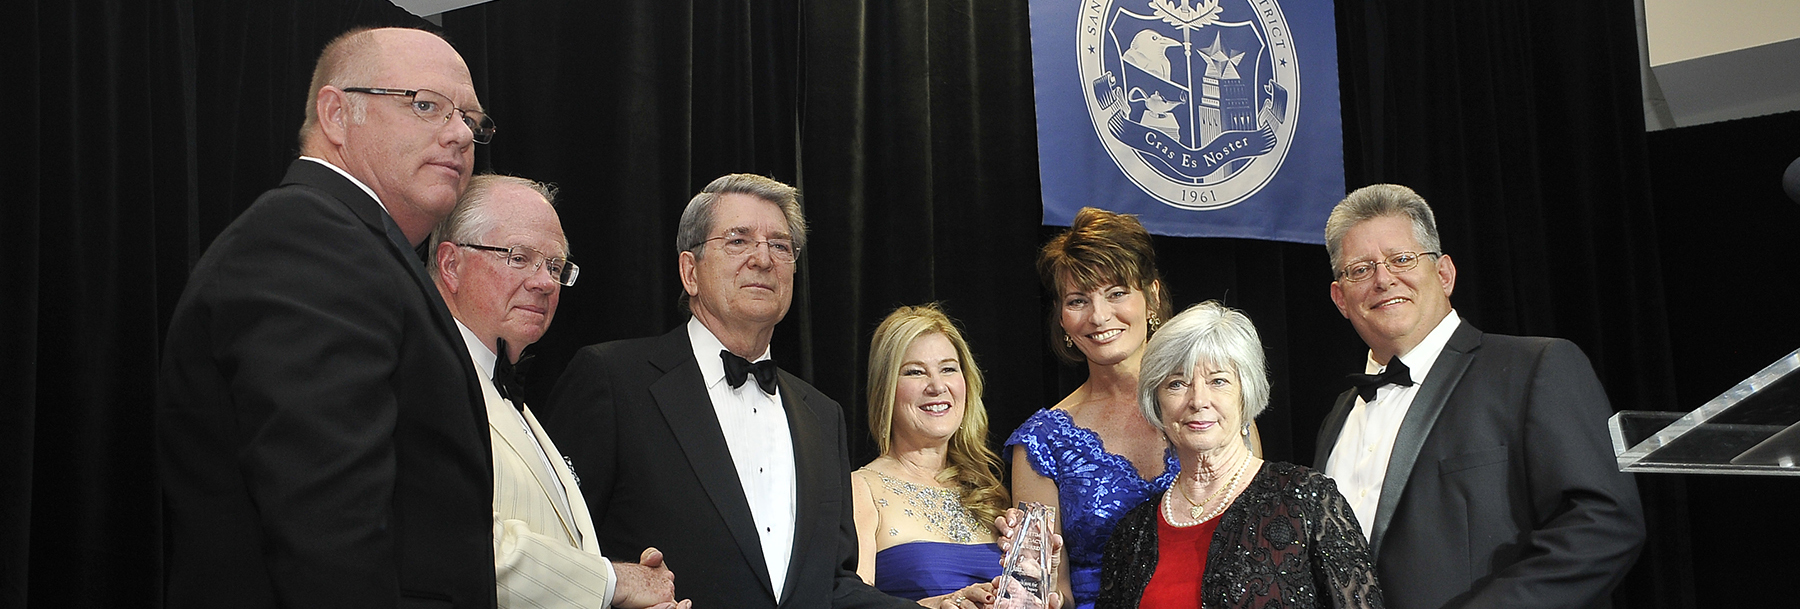 Gala raises $300,000 for student scholarships